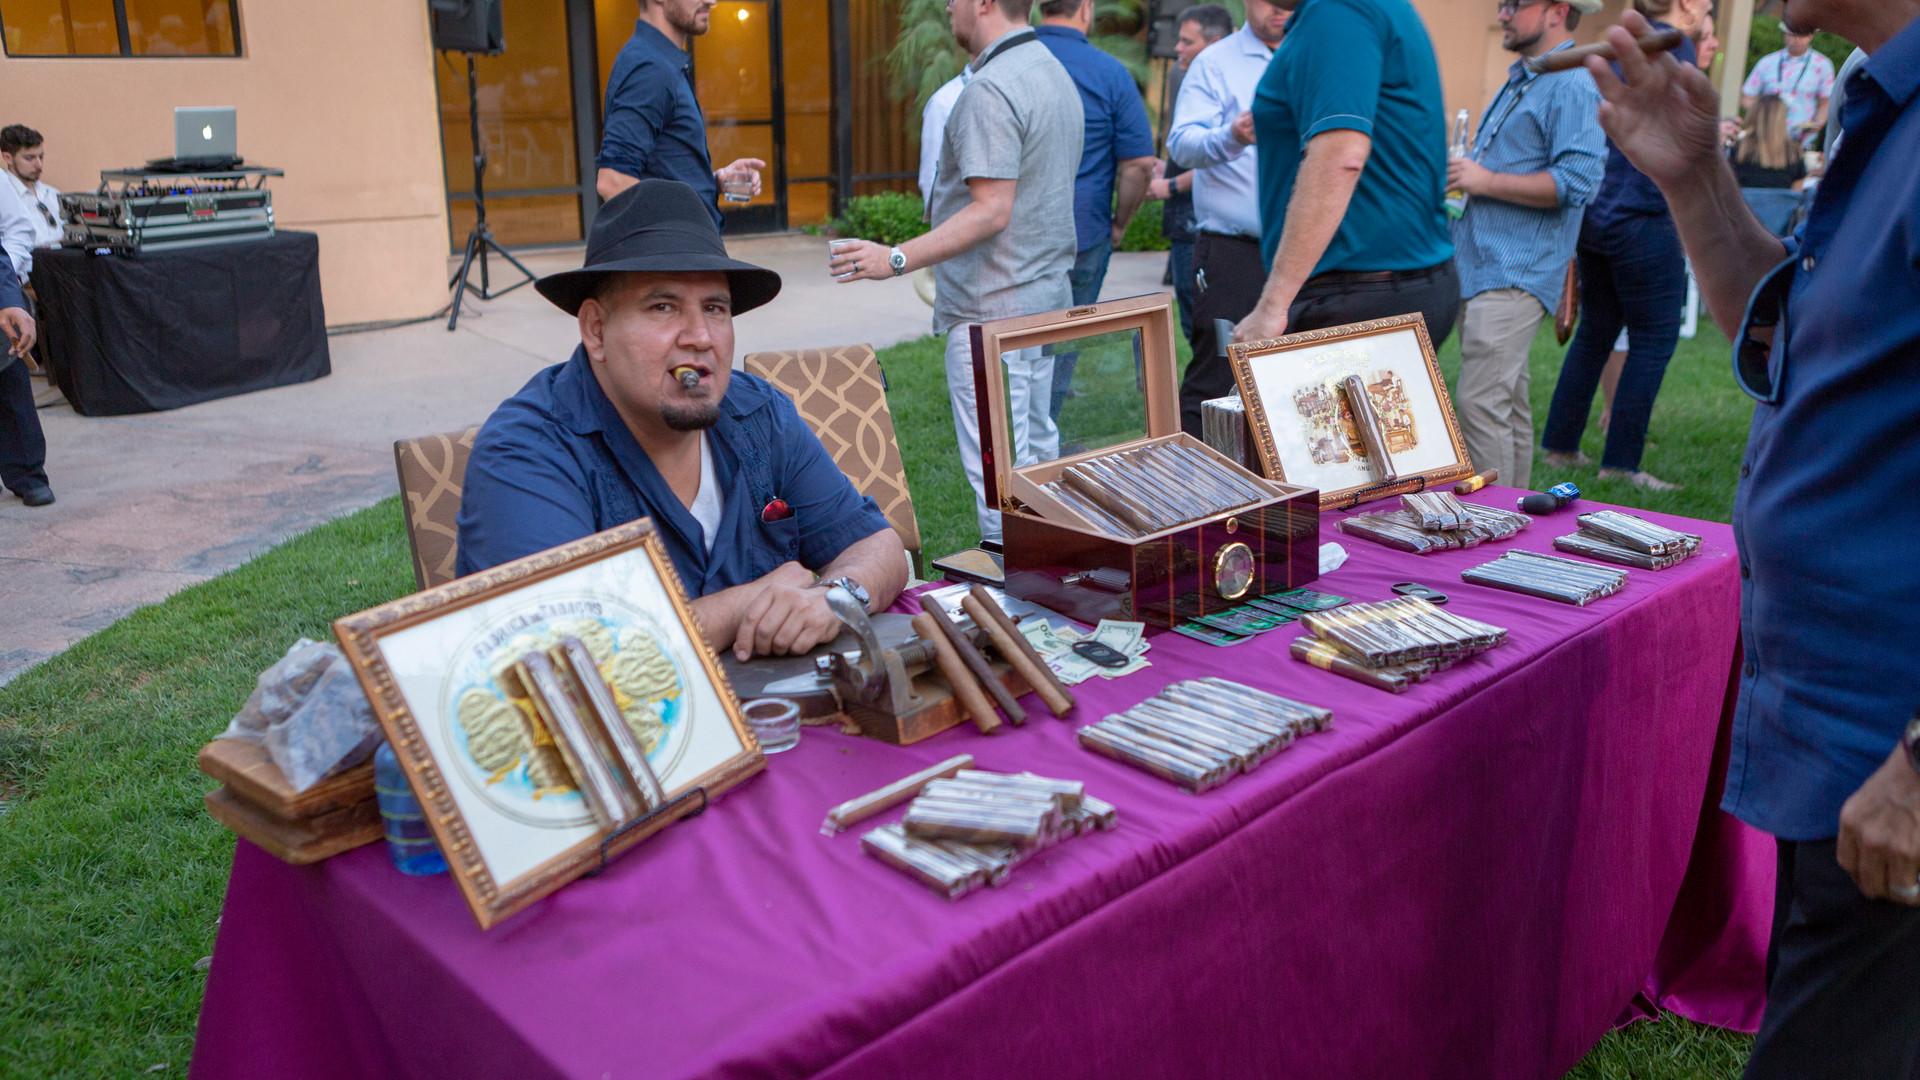 Cigar rollers setup at Havana Nights themed event